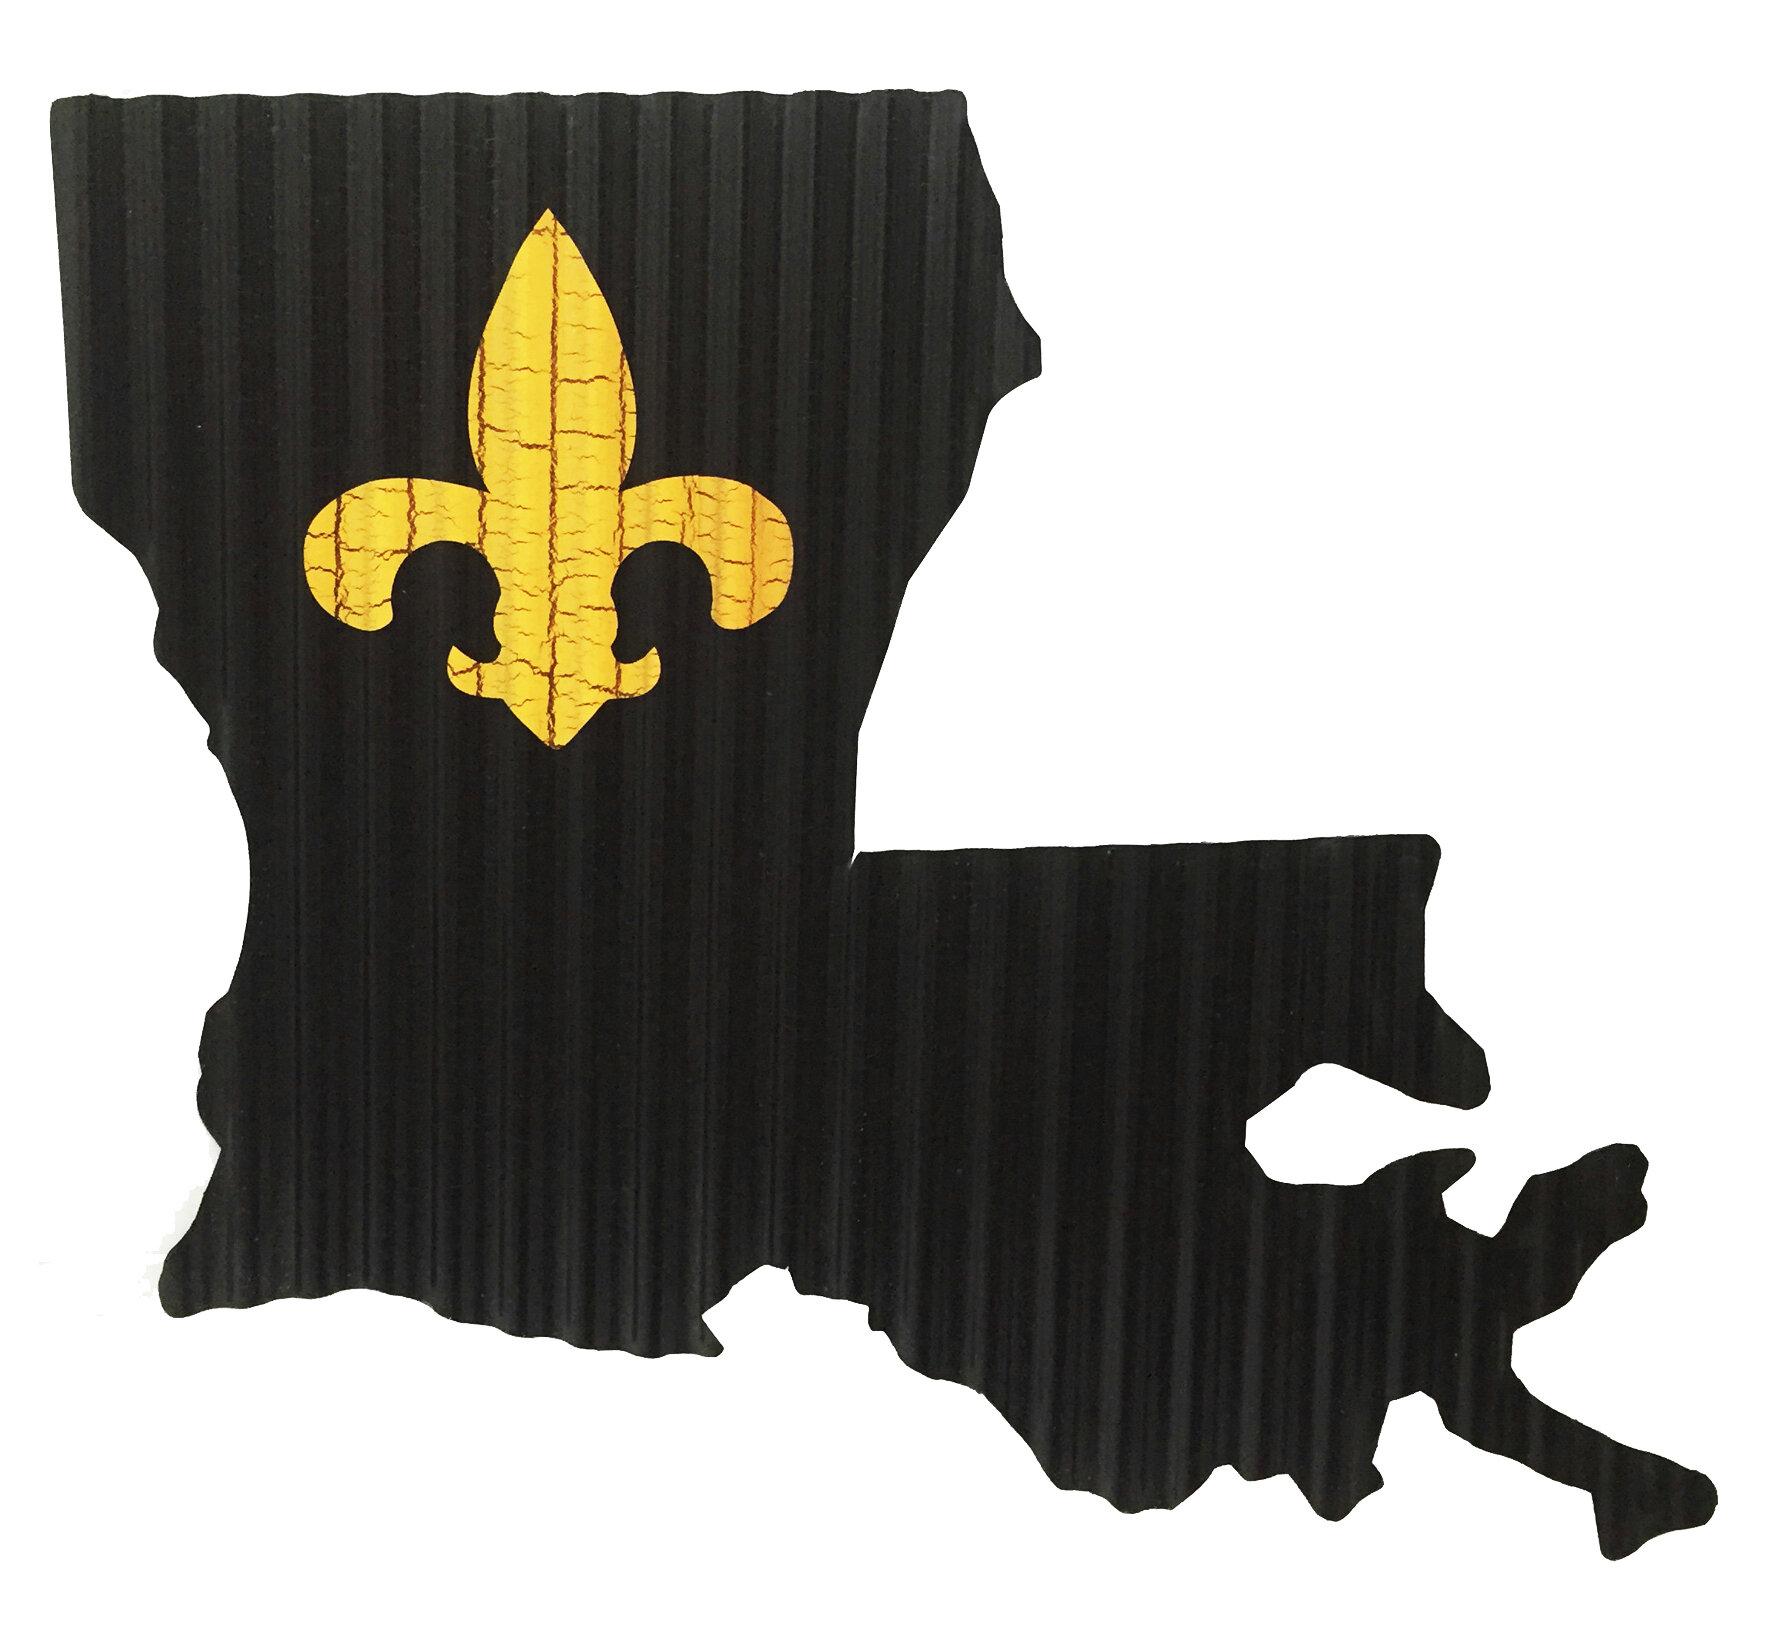 Ebern Designs Crackled Fleur De Lis Louisiana State Map Wall Decor Wayfair